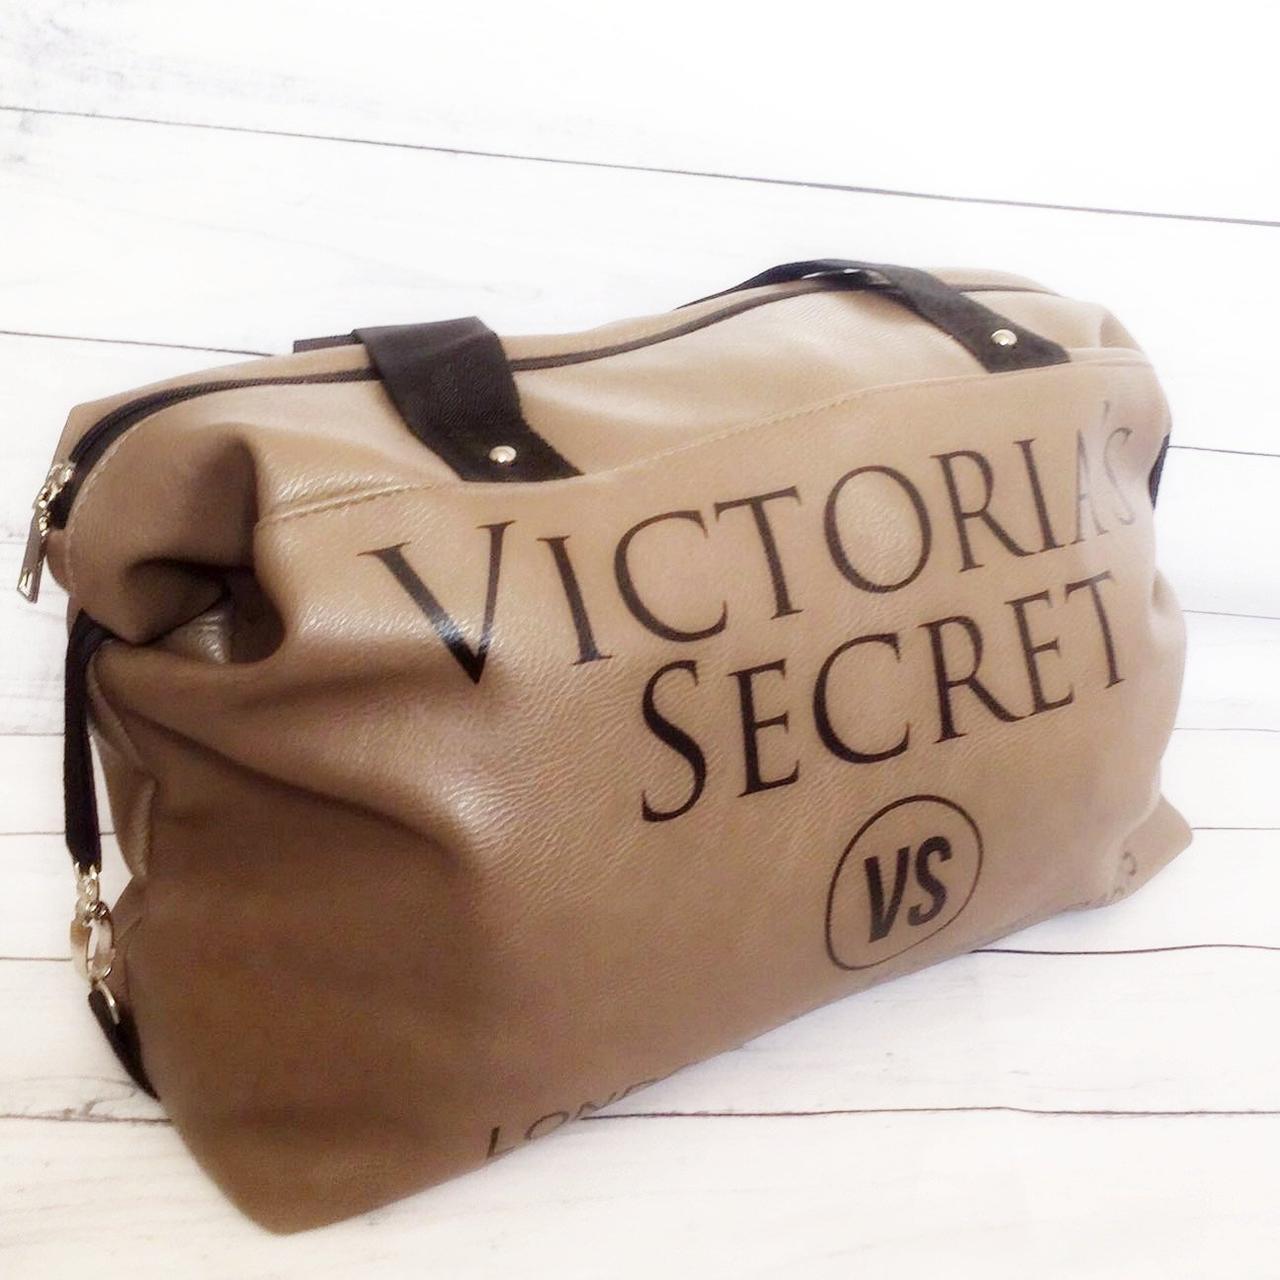 Спортивная сумка Victoria's Secret (Виктория Сикрет), бежевая